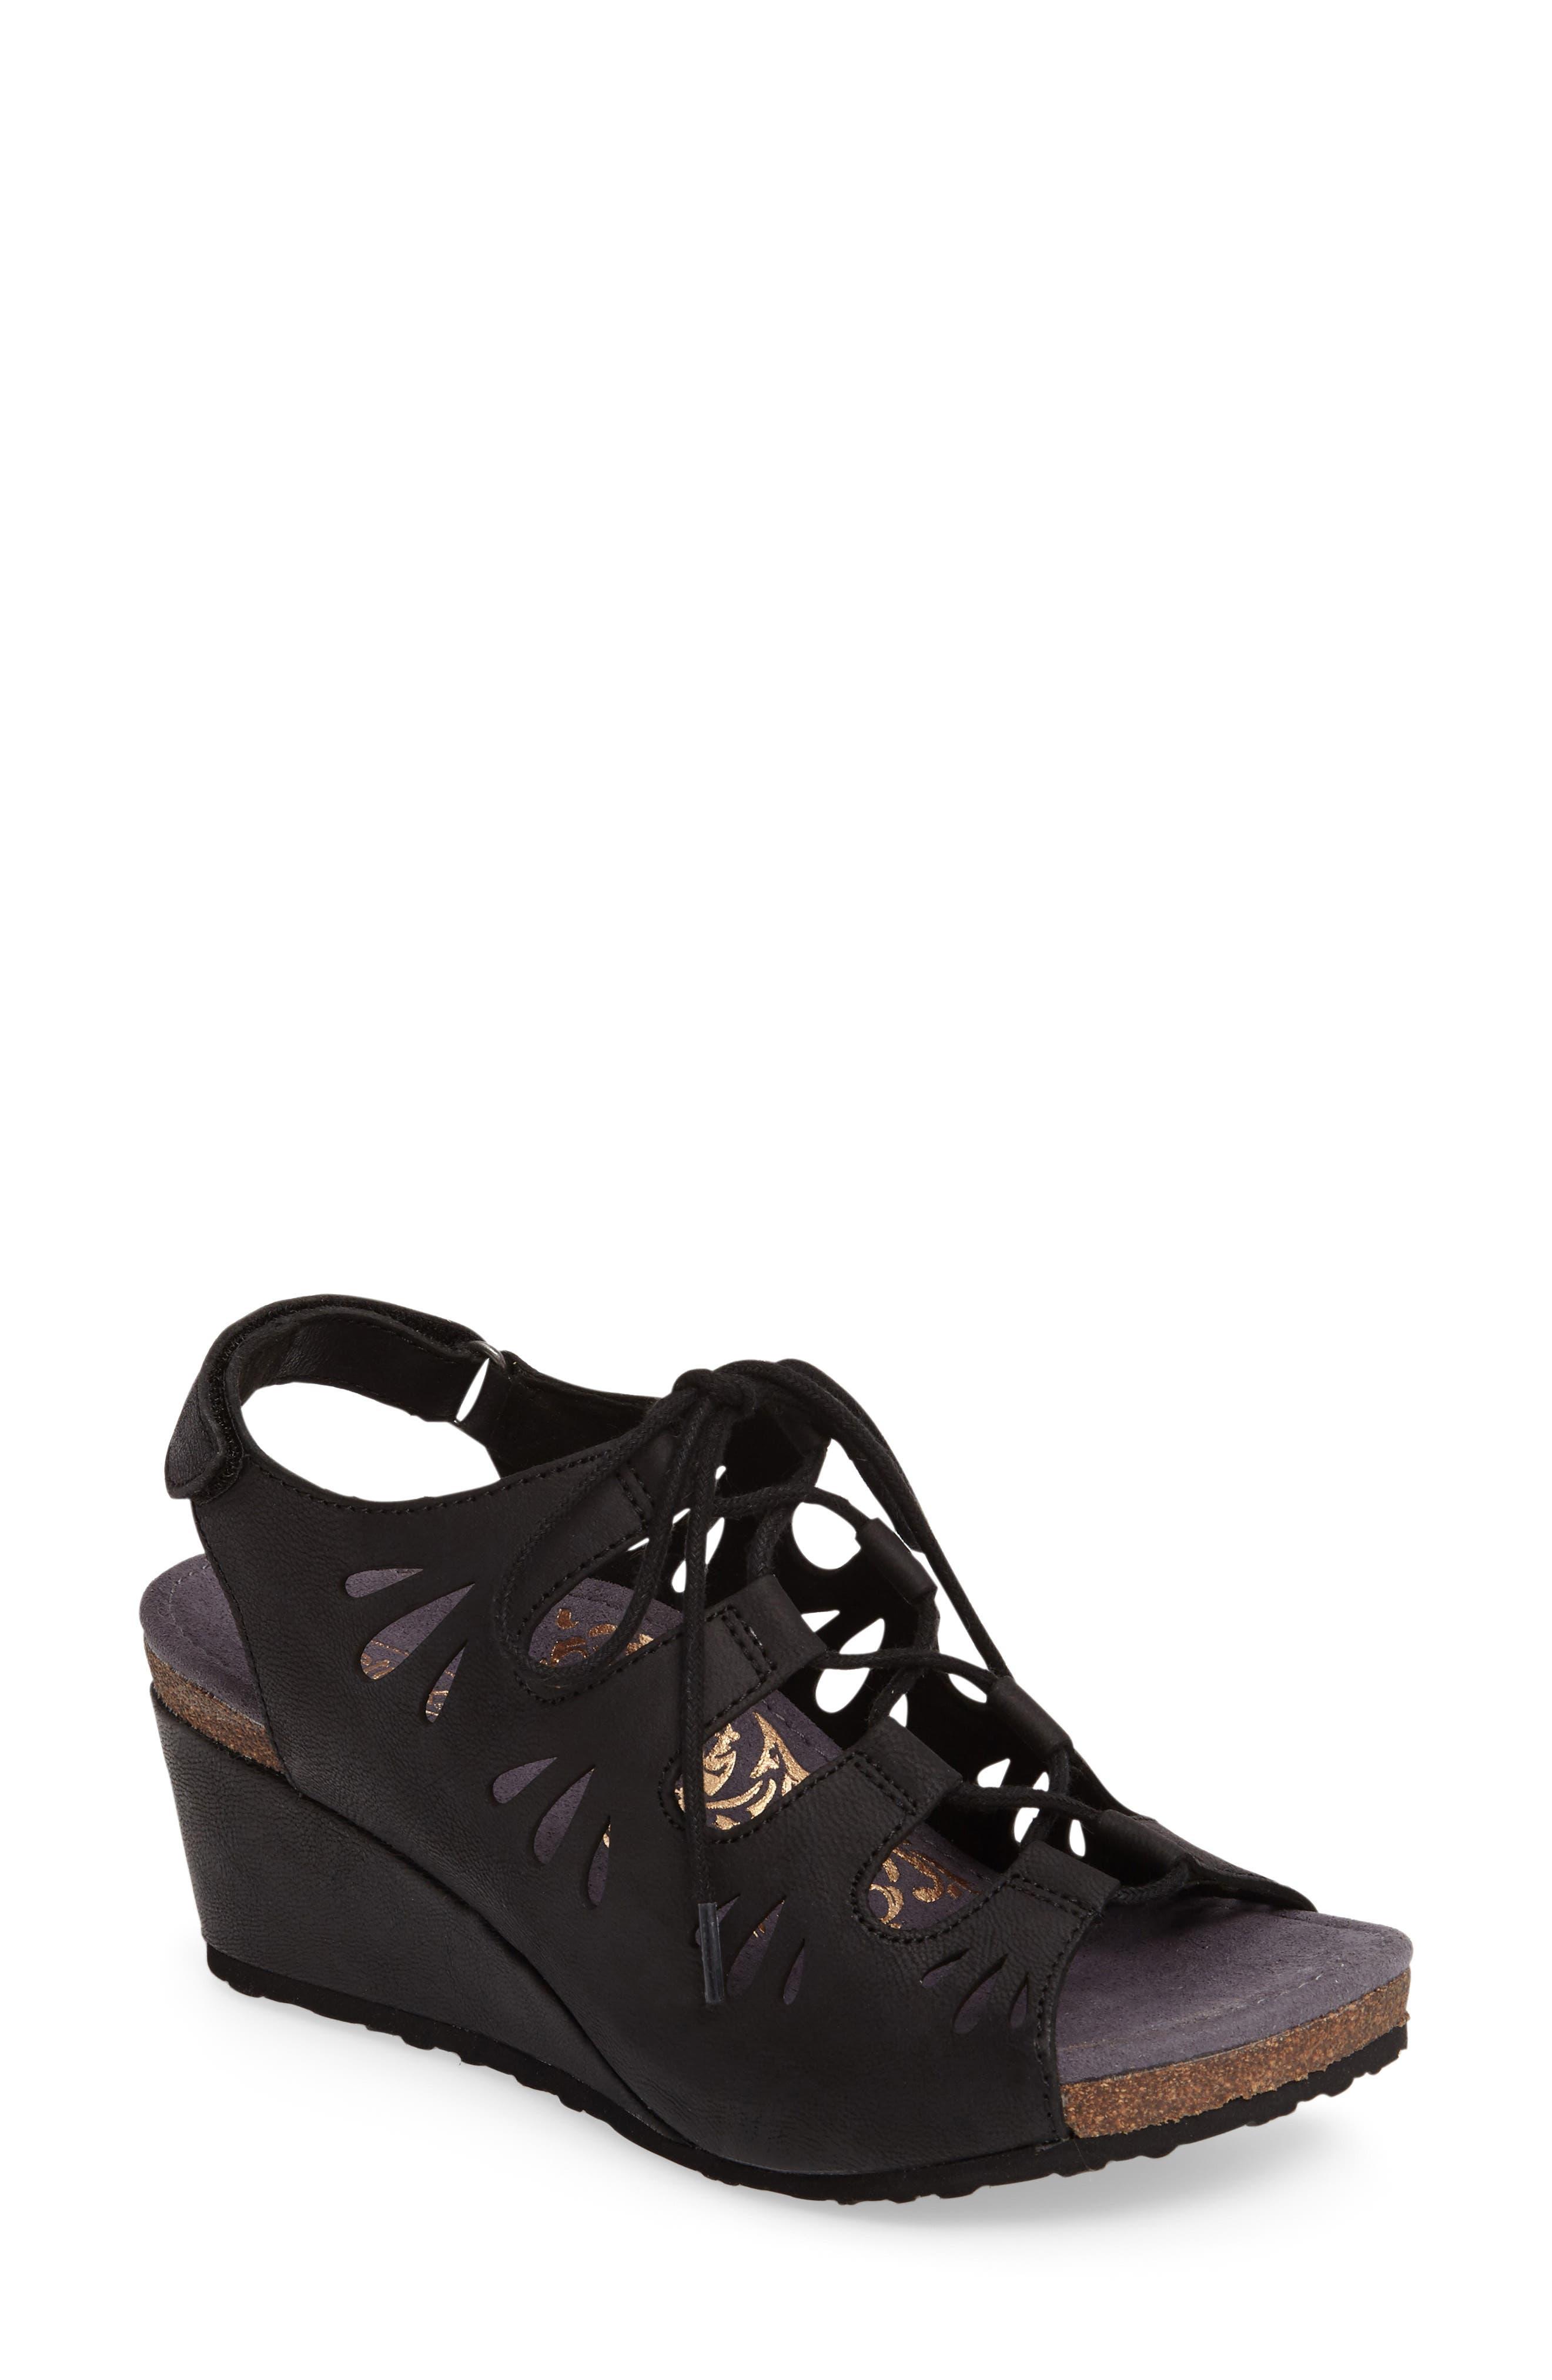 Aetrex Giselle Slingback Wedge Sandal (Women)